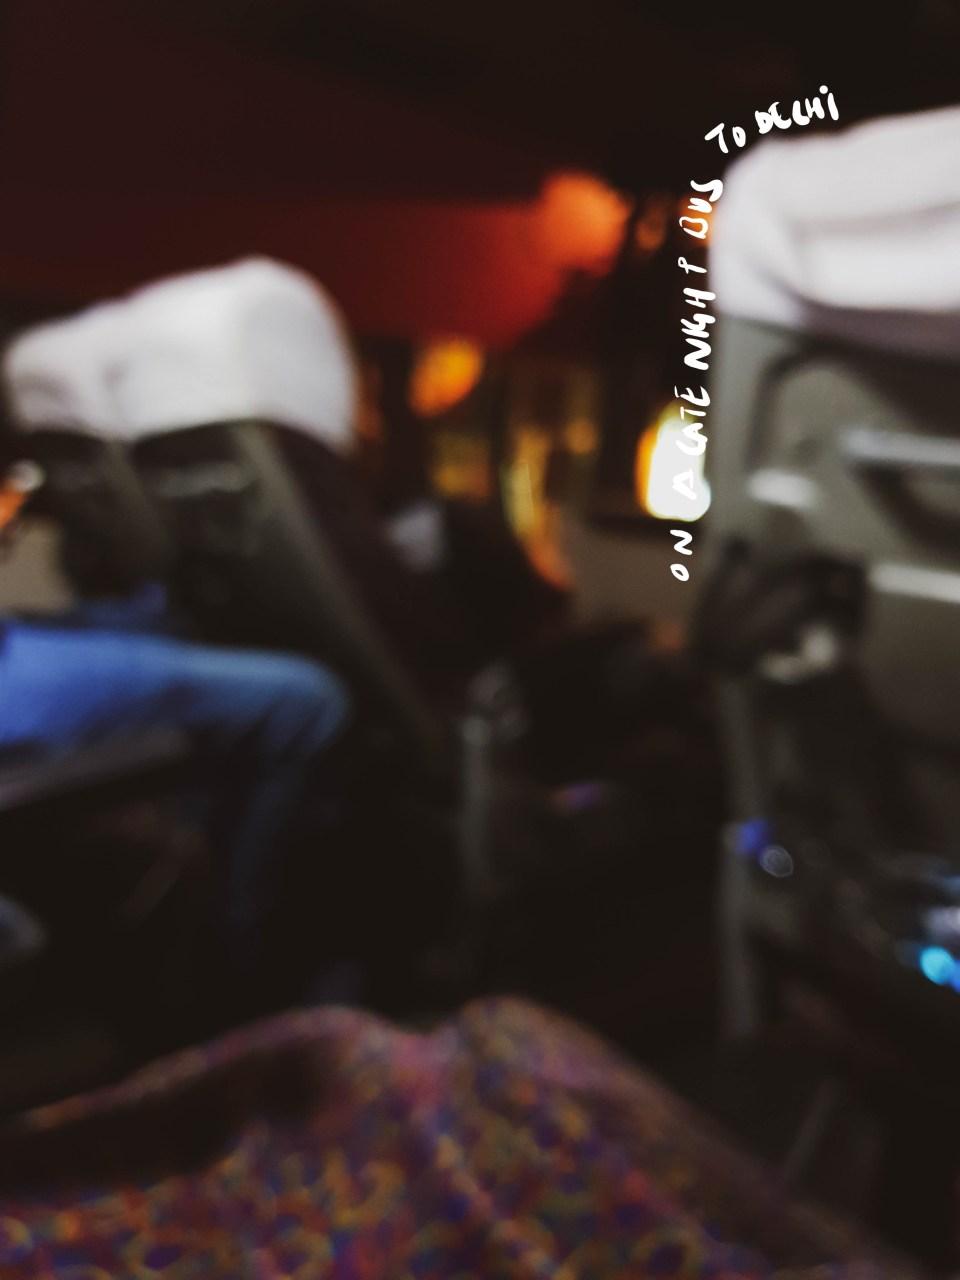 1-1 THREE DAYS IN JAIPUR - A PHOTO DIARY/ TESTING SAMSUNG S9